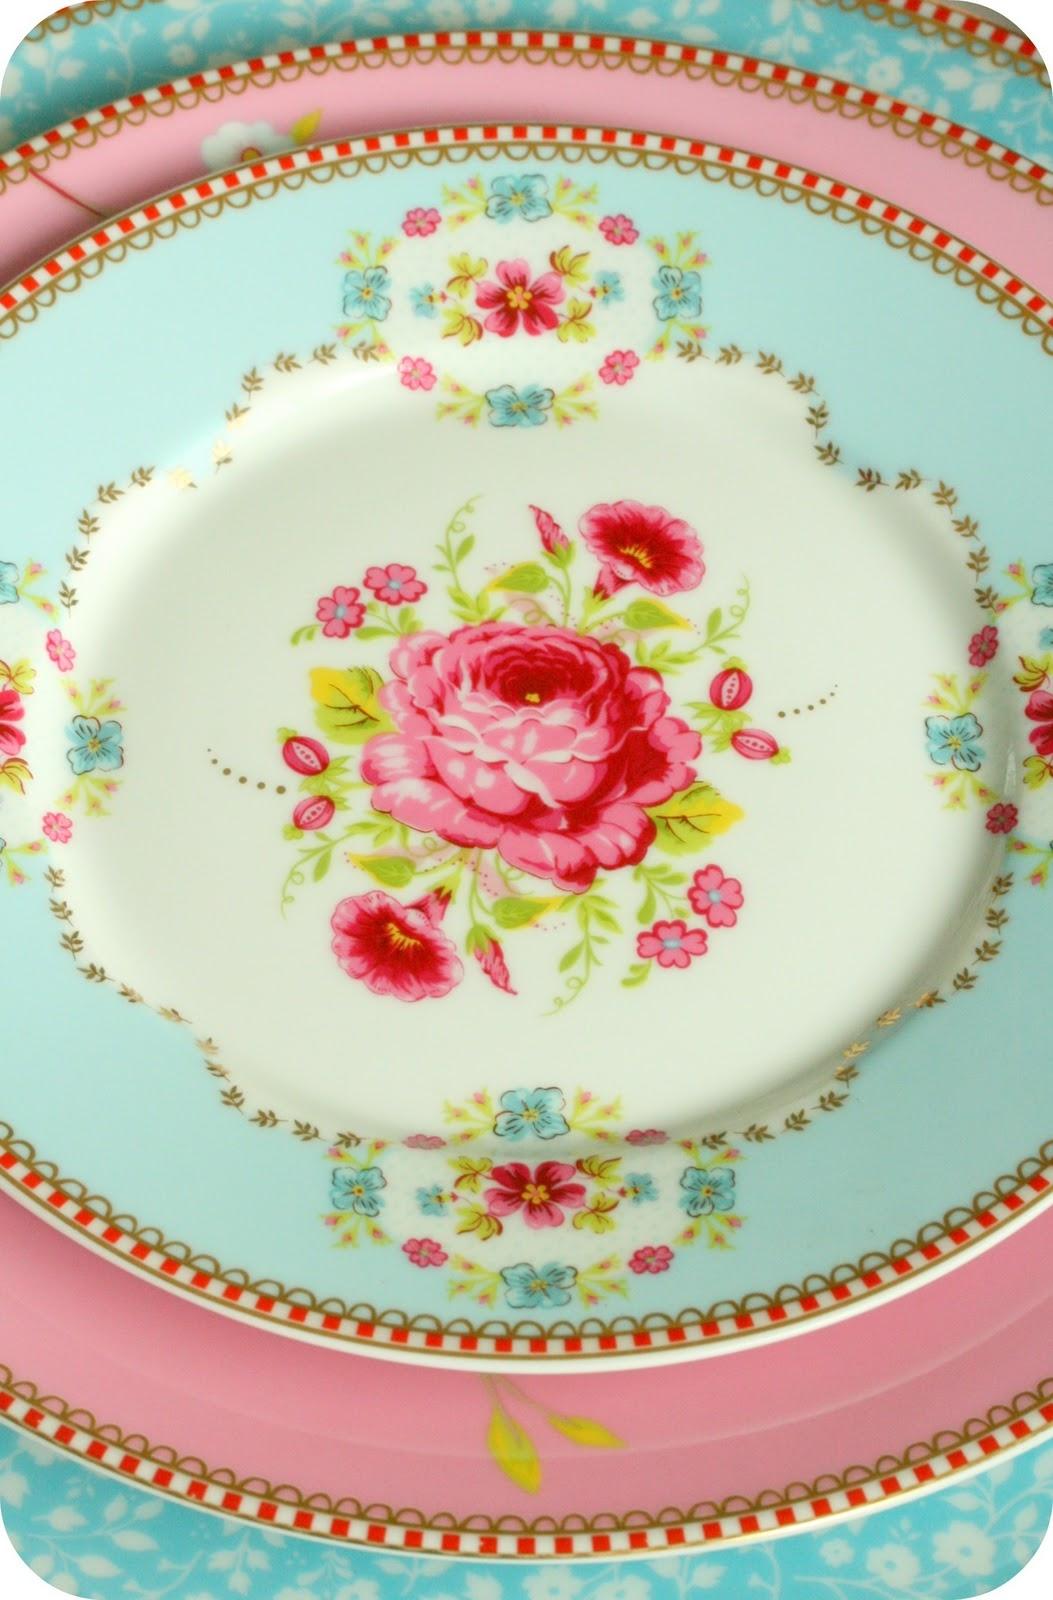 Floral dinnerware sets & Floral Dinnerware Sets - Foter